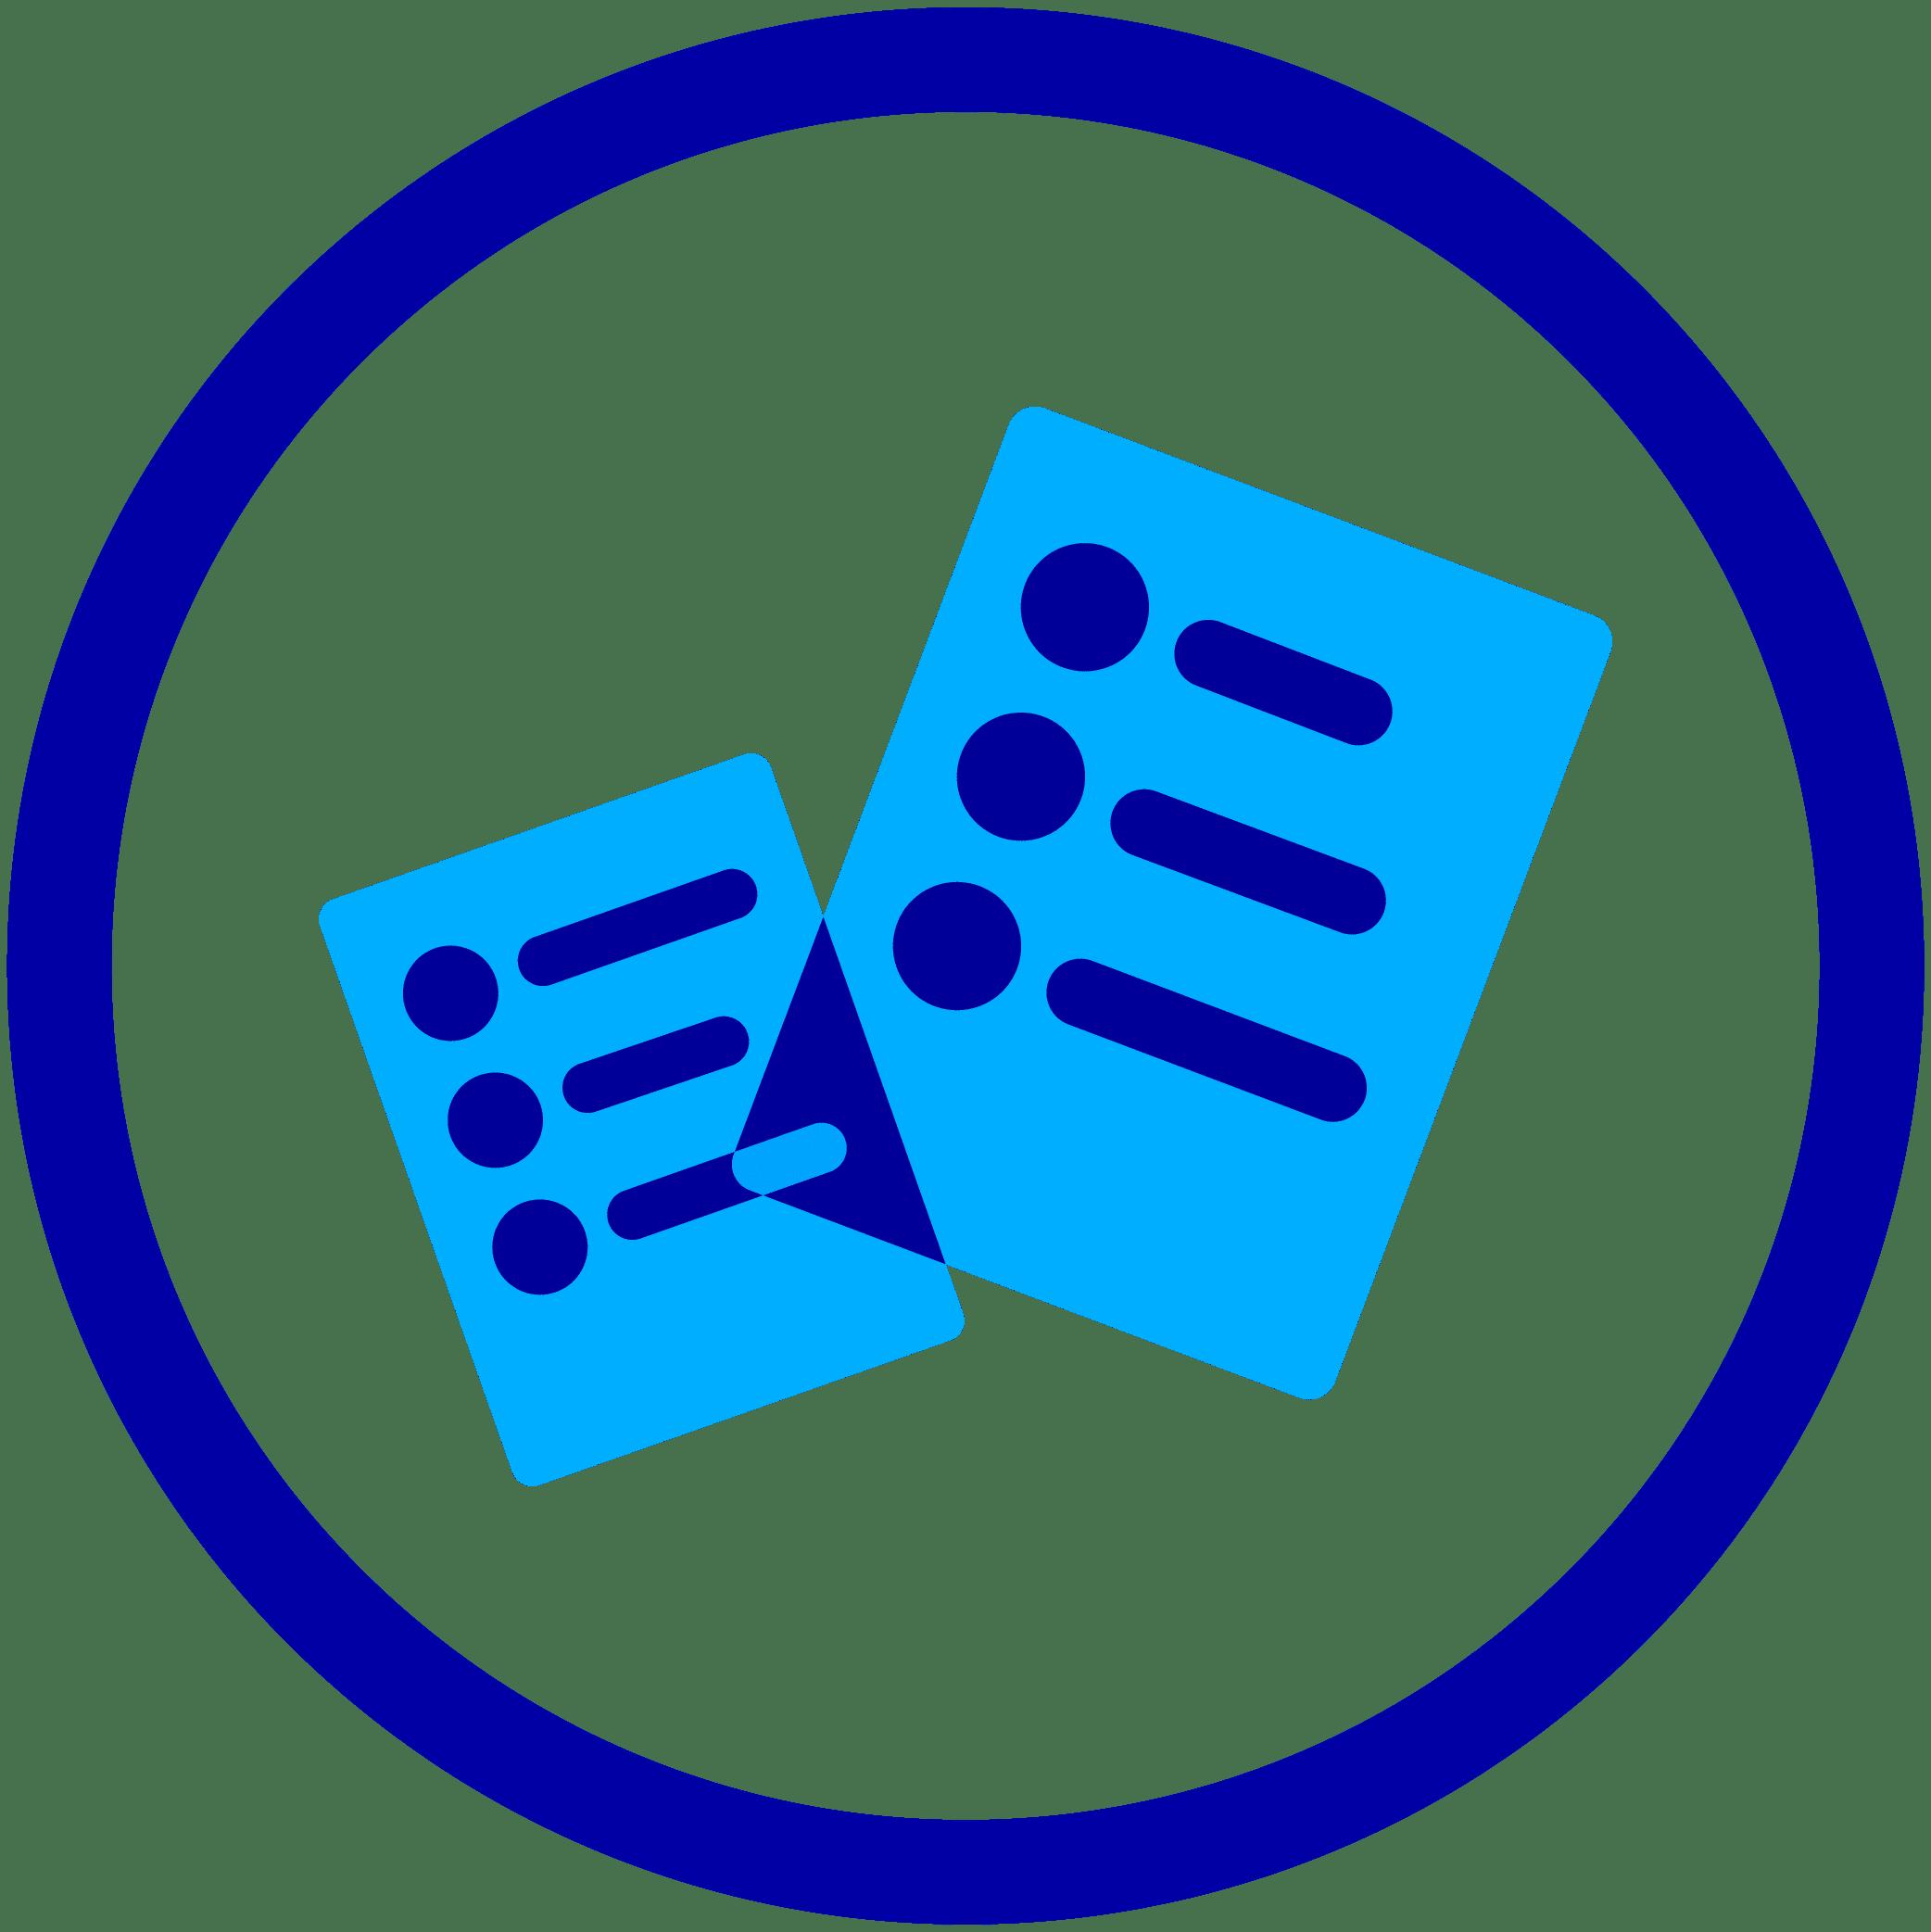 https://fr.fi-group.com/wp-content/uploads/2021/09/blue-icons-set_1-07.png